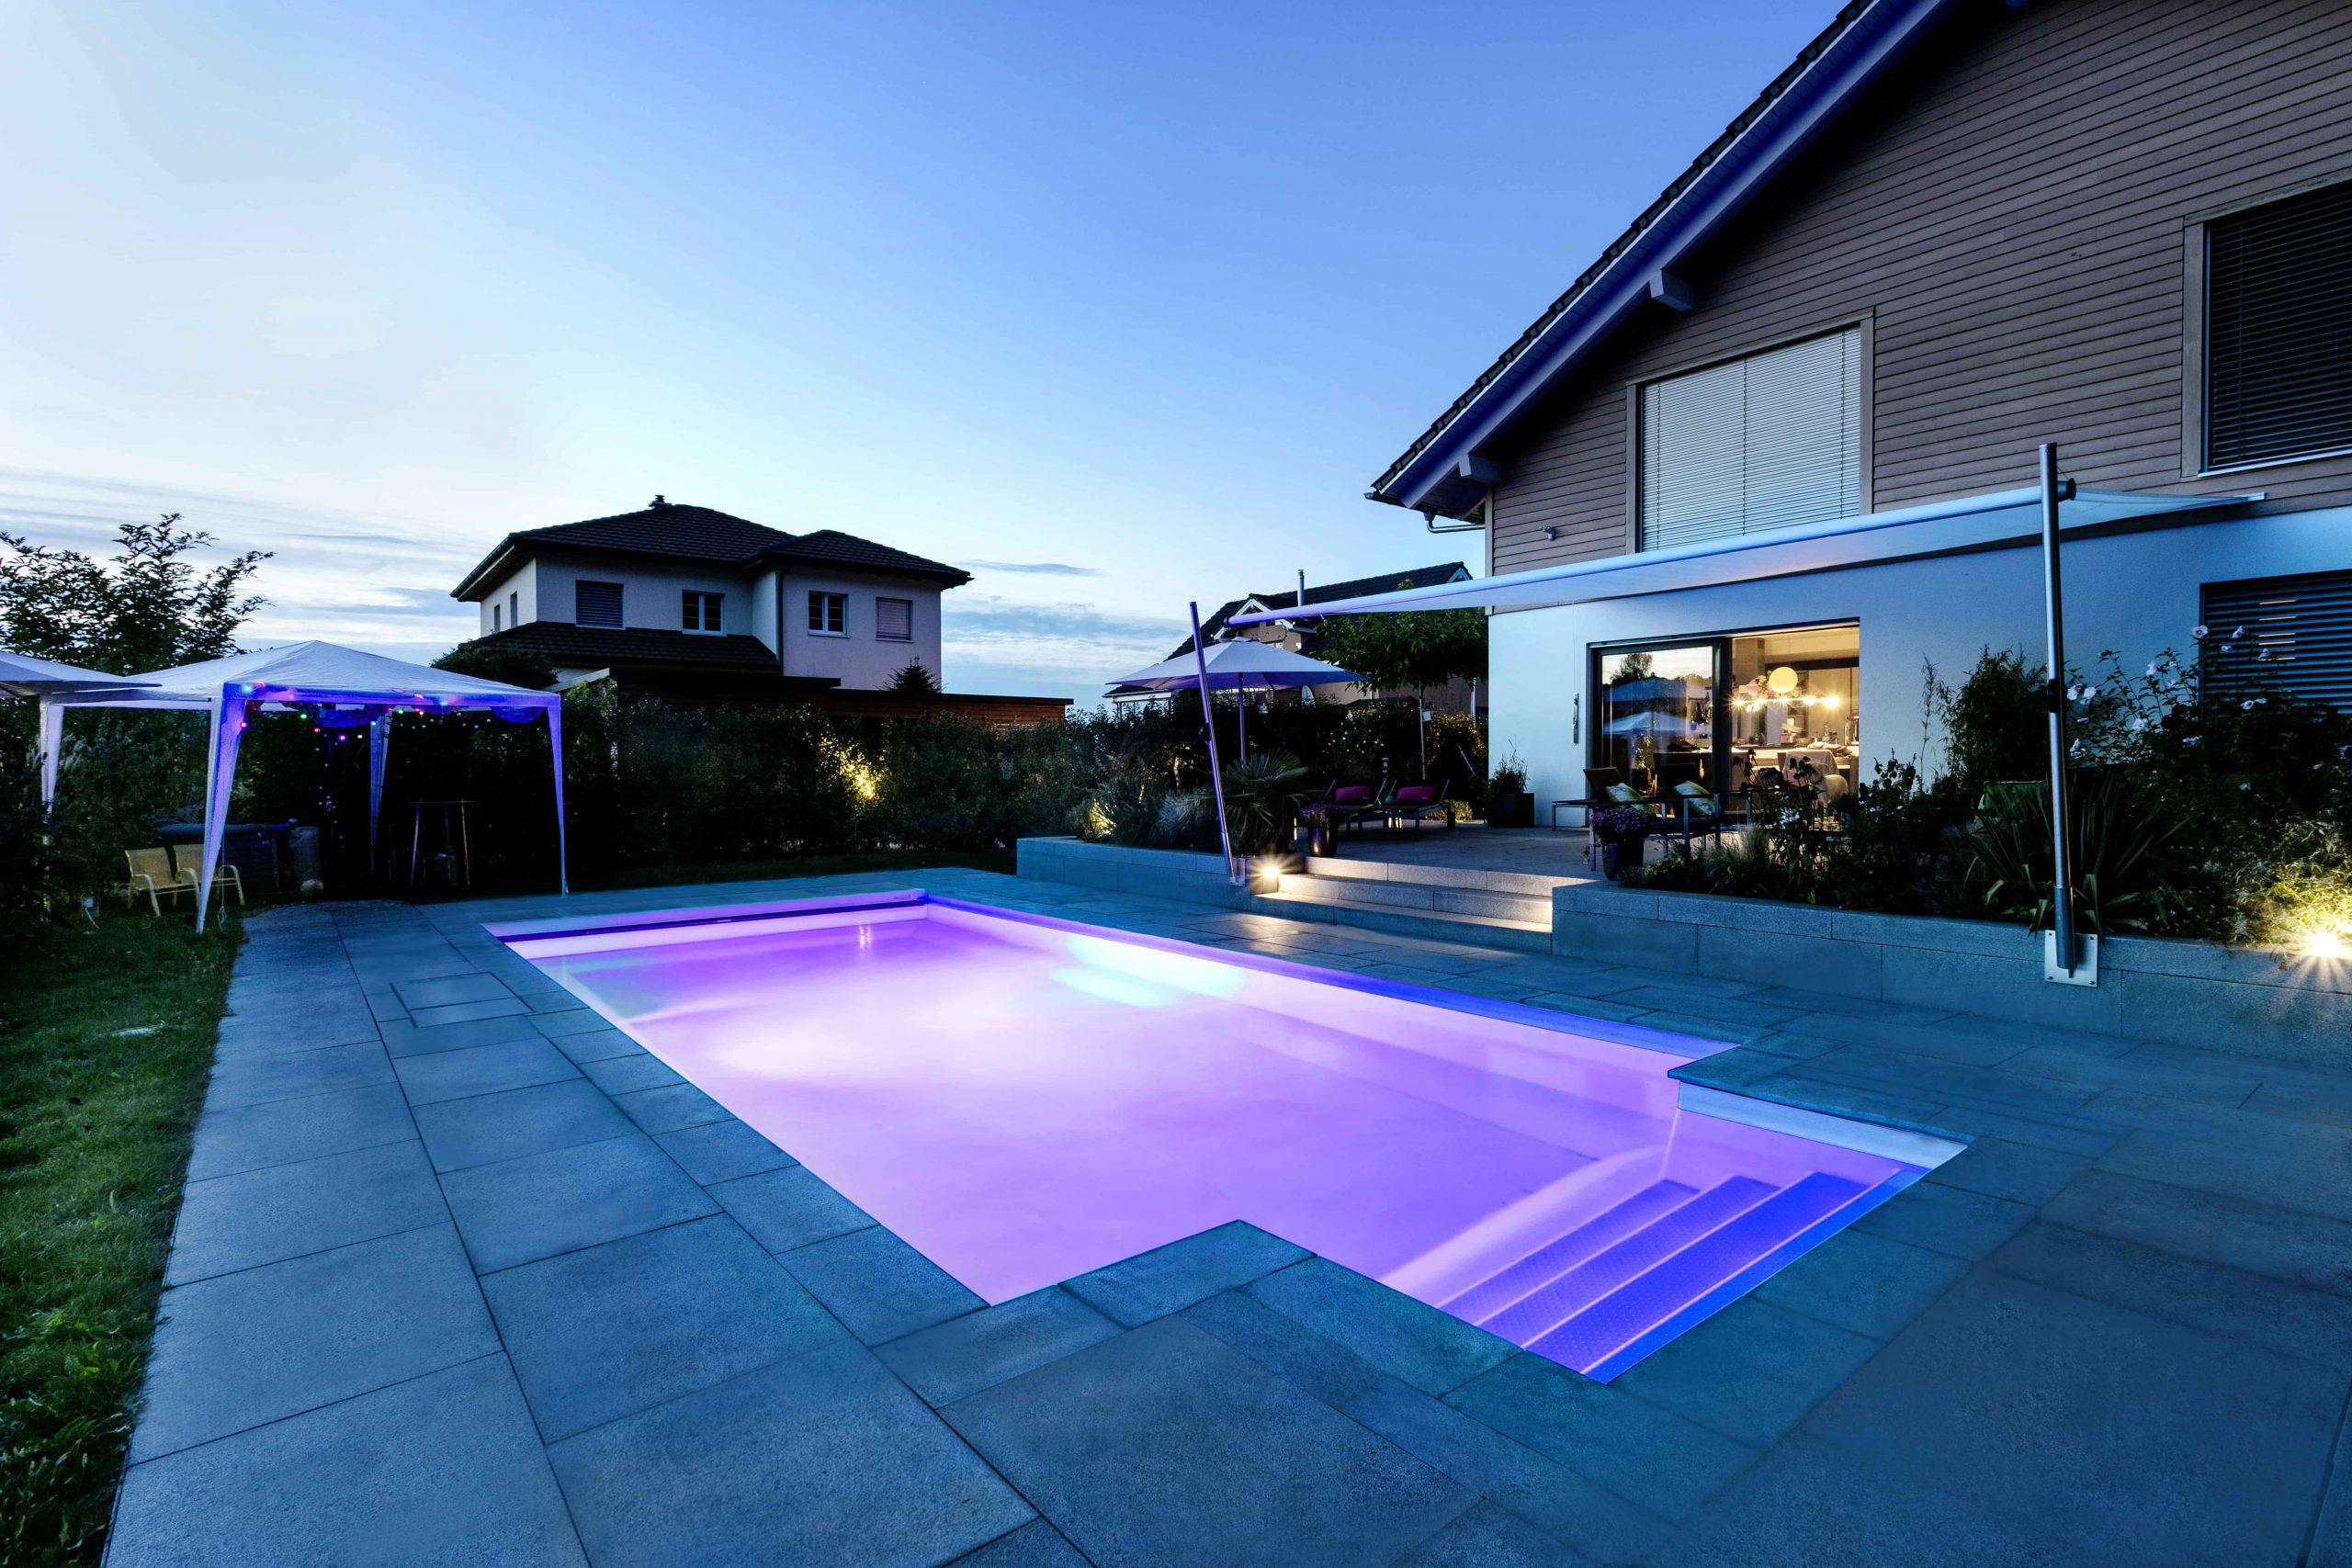 Pool Beleuchtung LED-Strahler